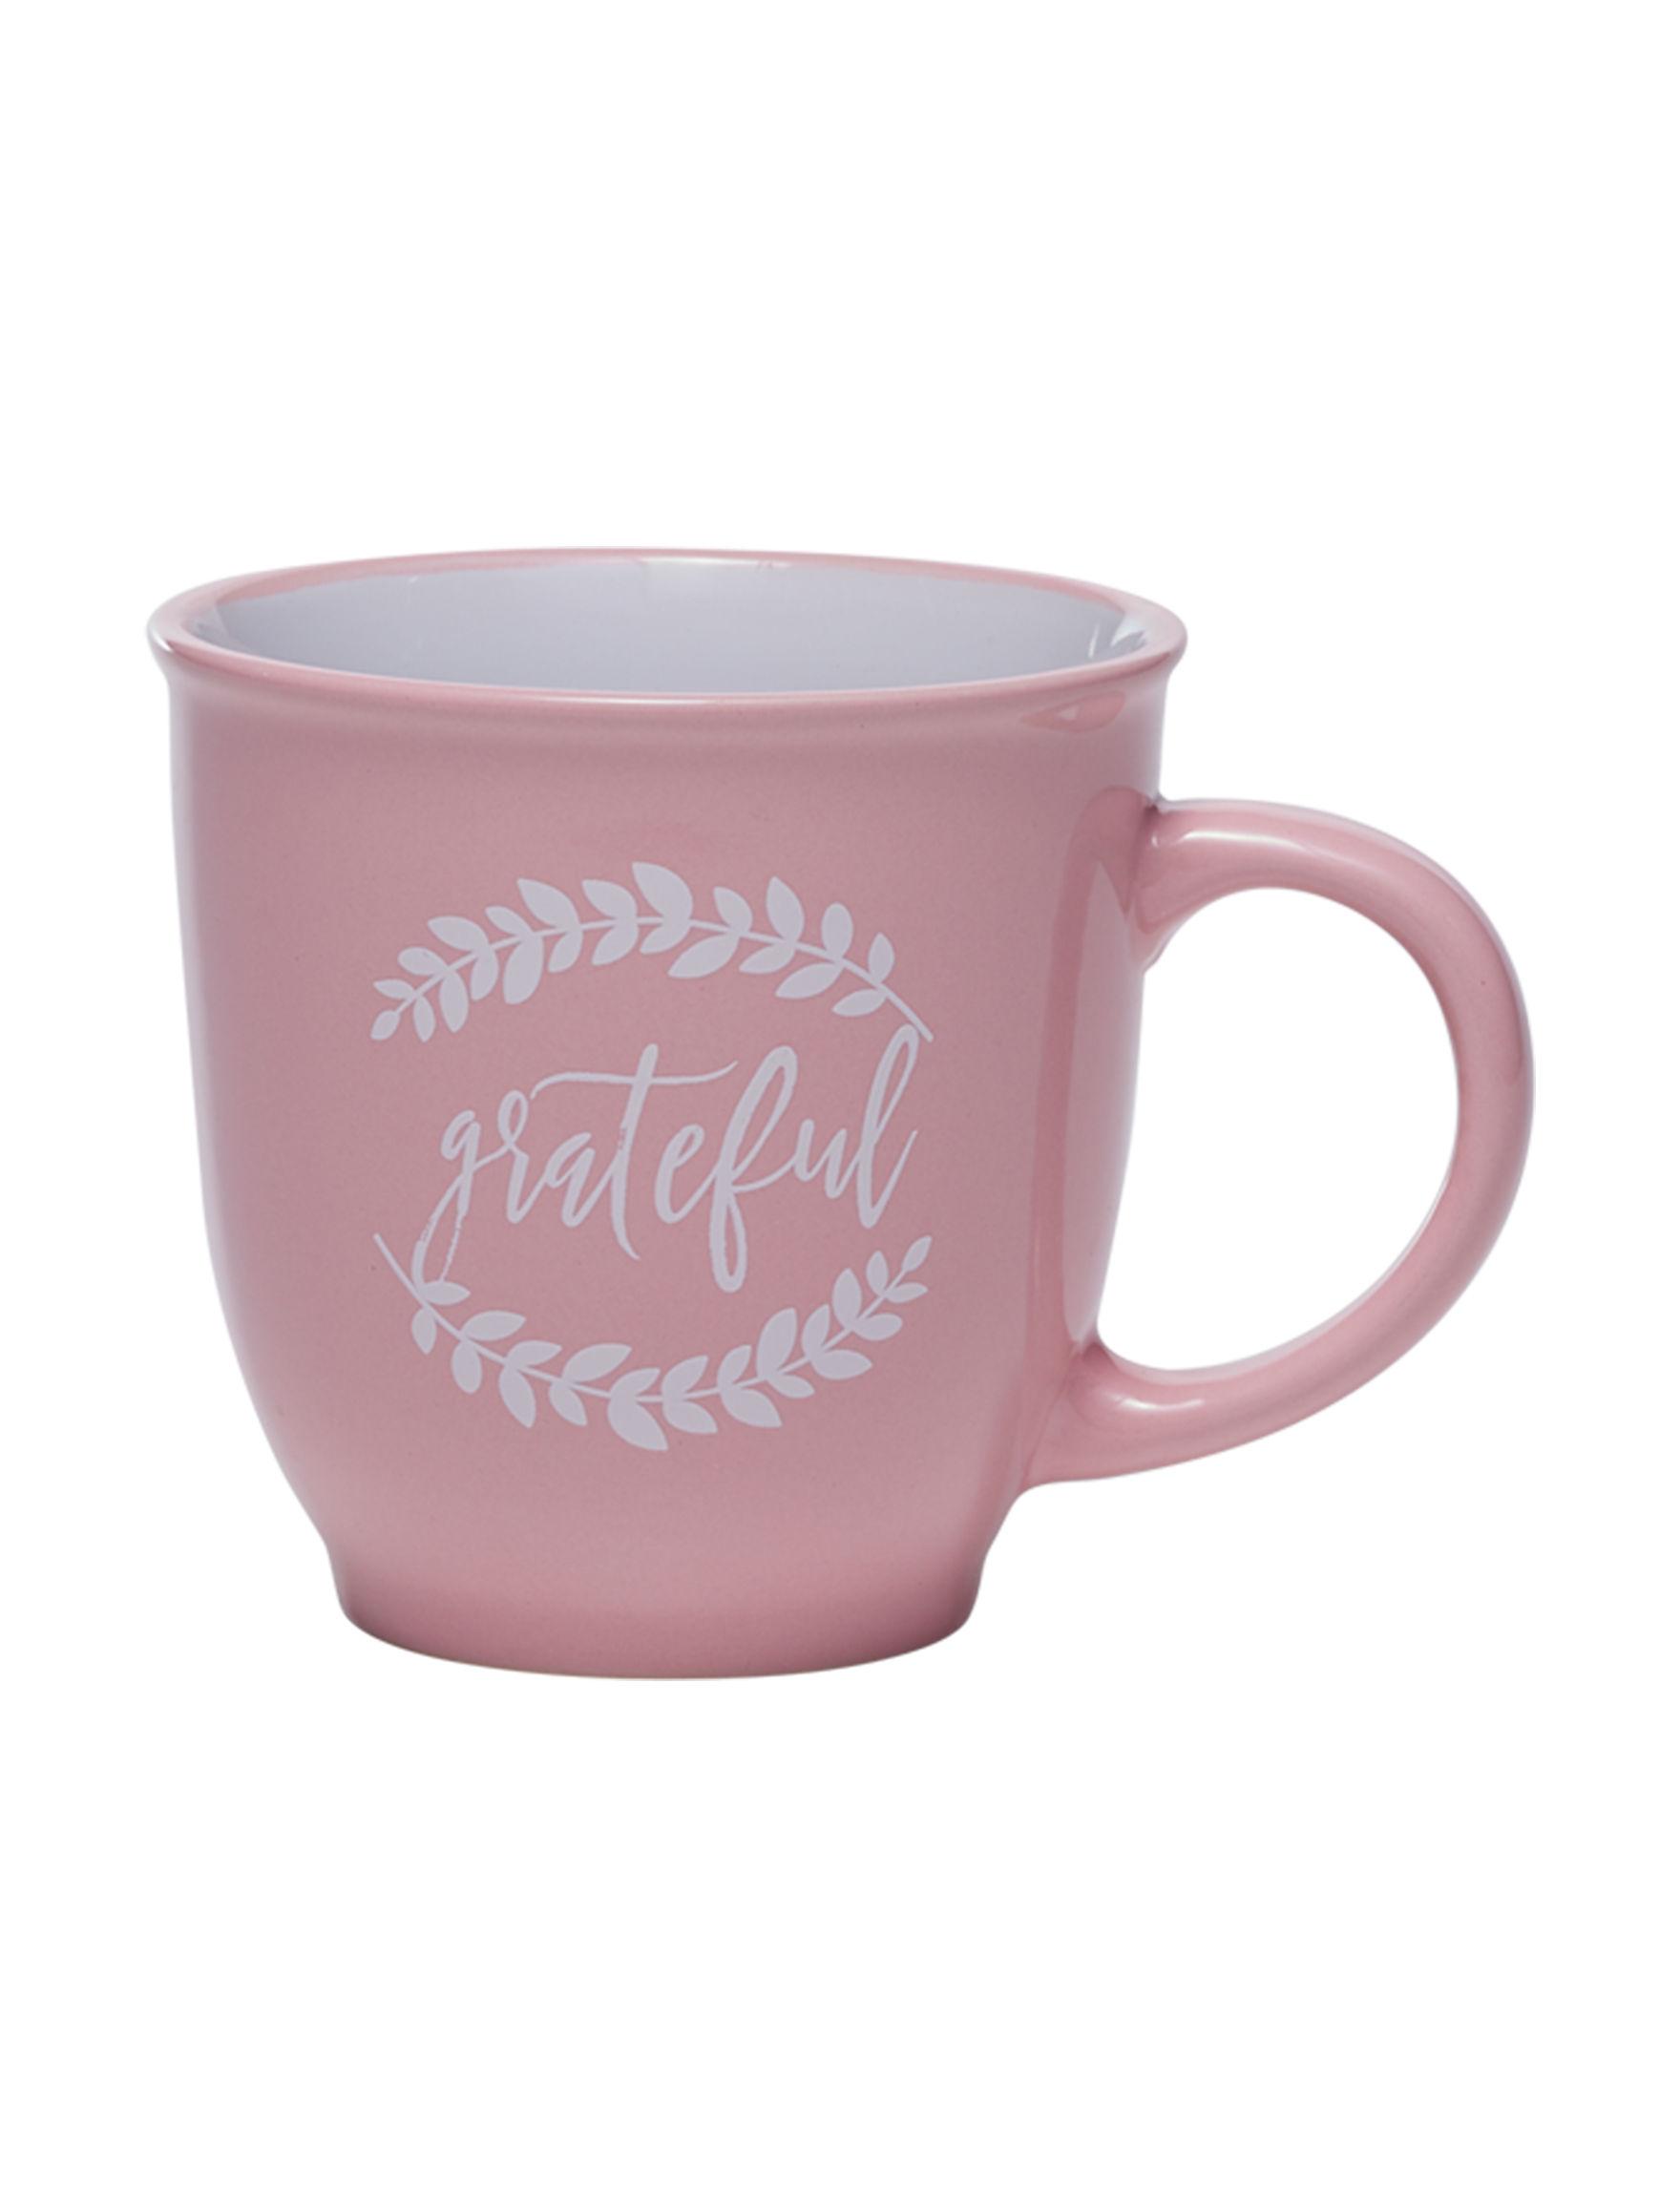 Sheffield Home Pink Mugs Drinkware